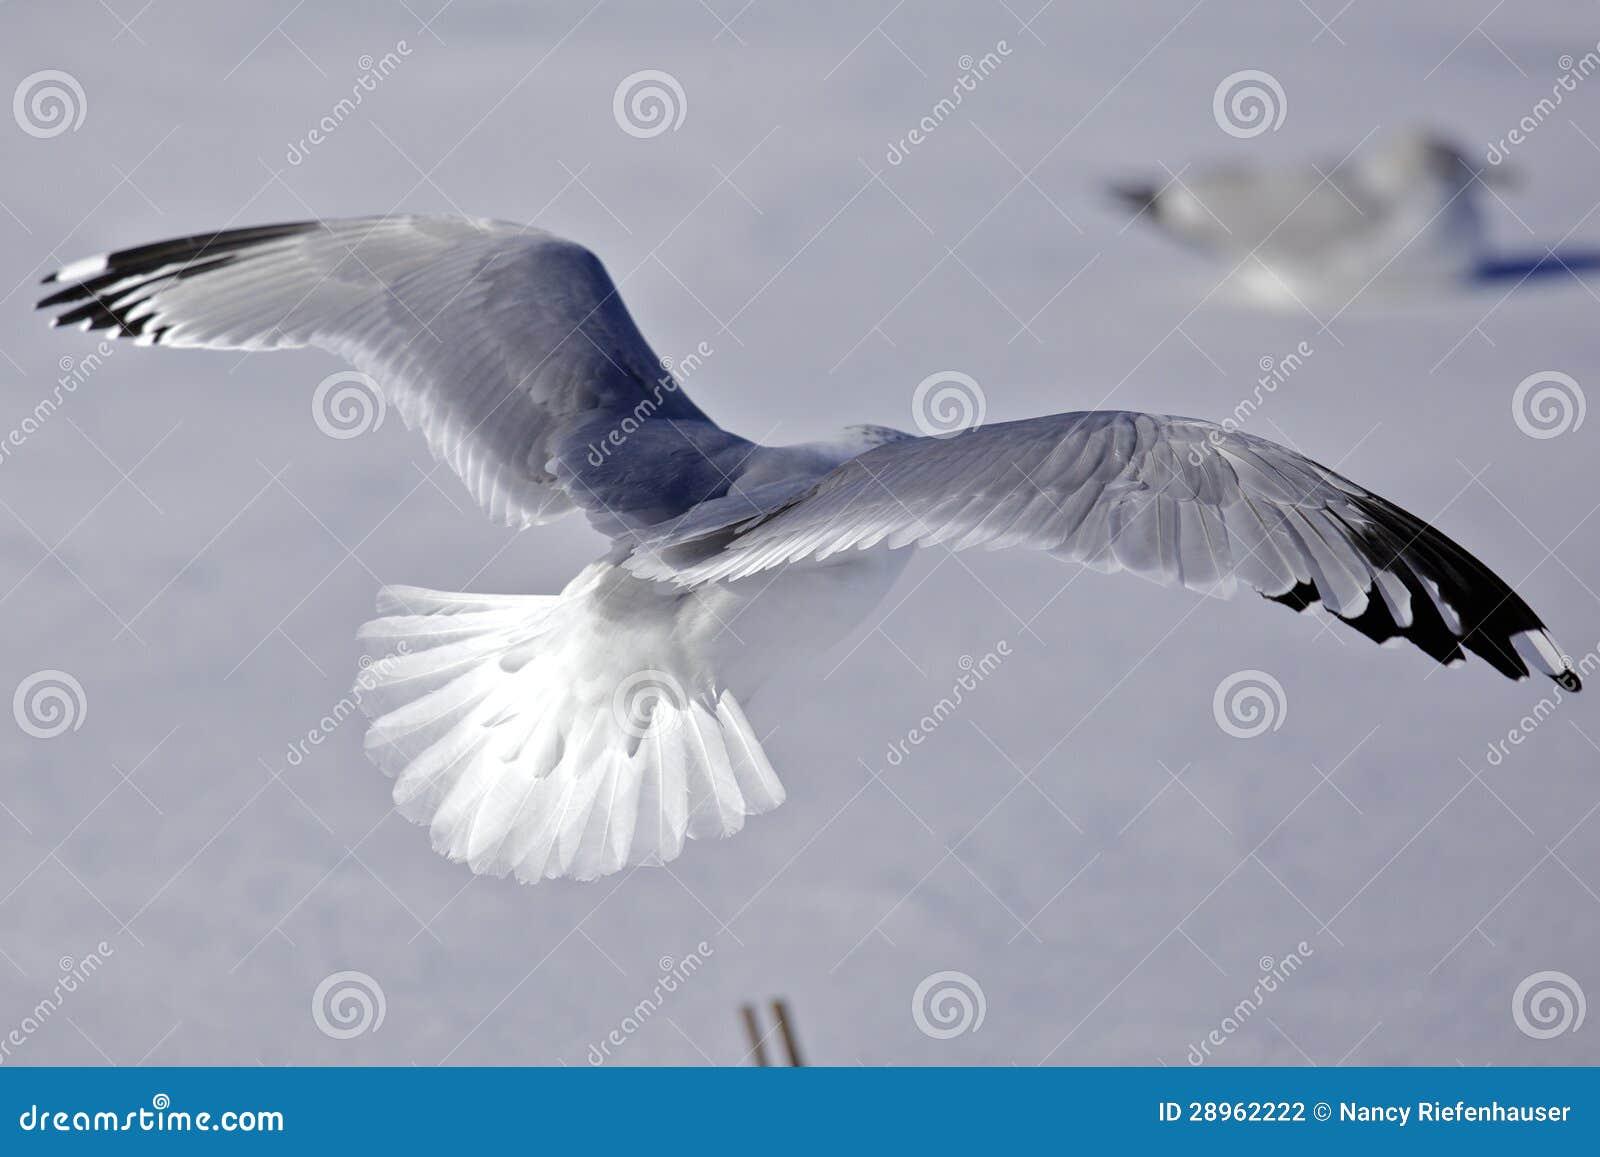 Stock Photography Flying Birds Image28962222